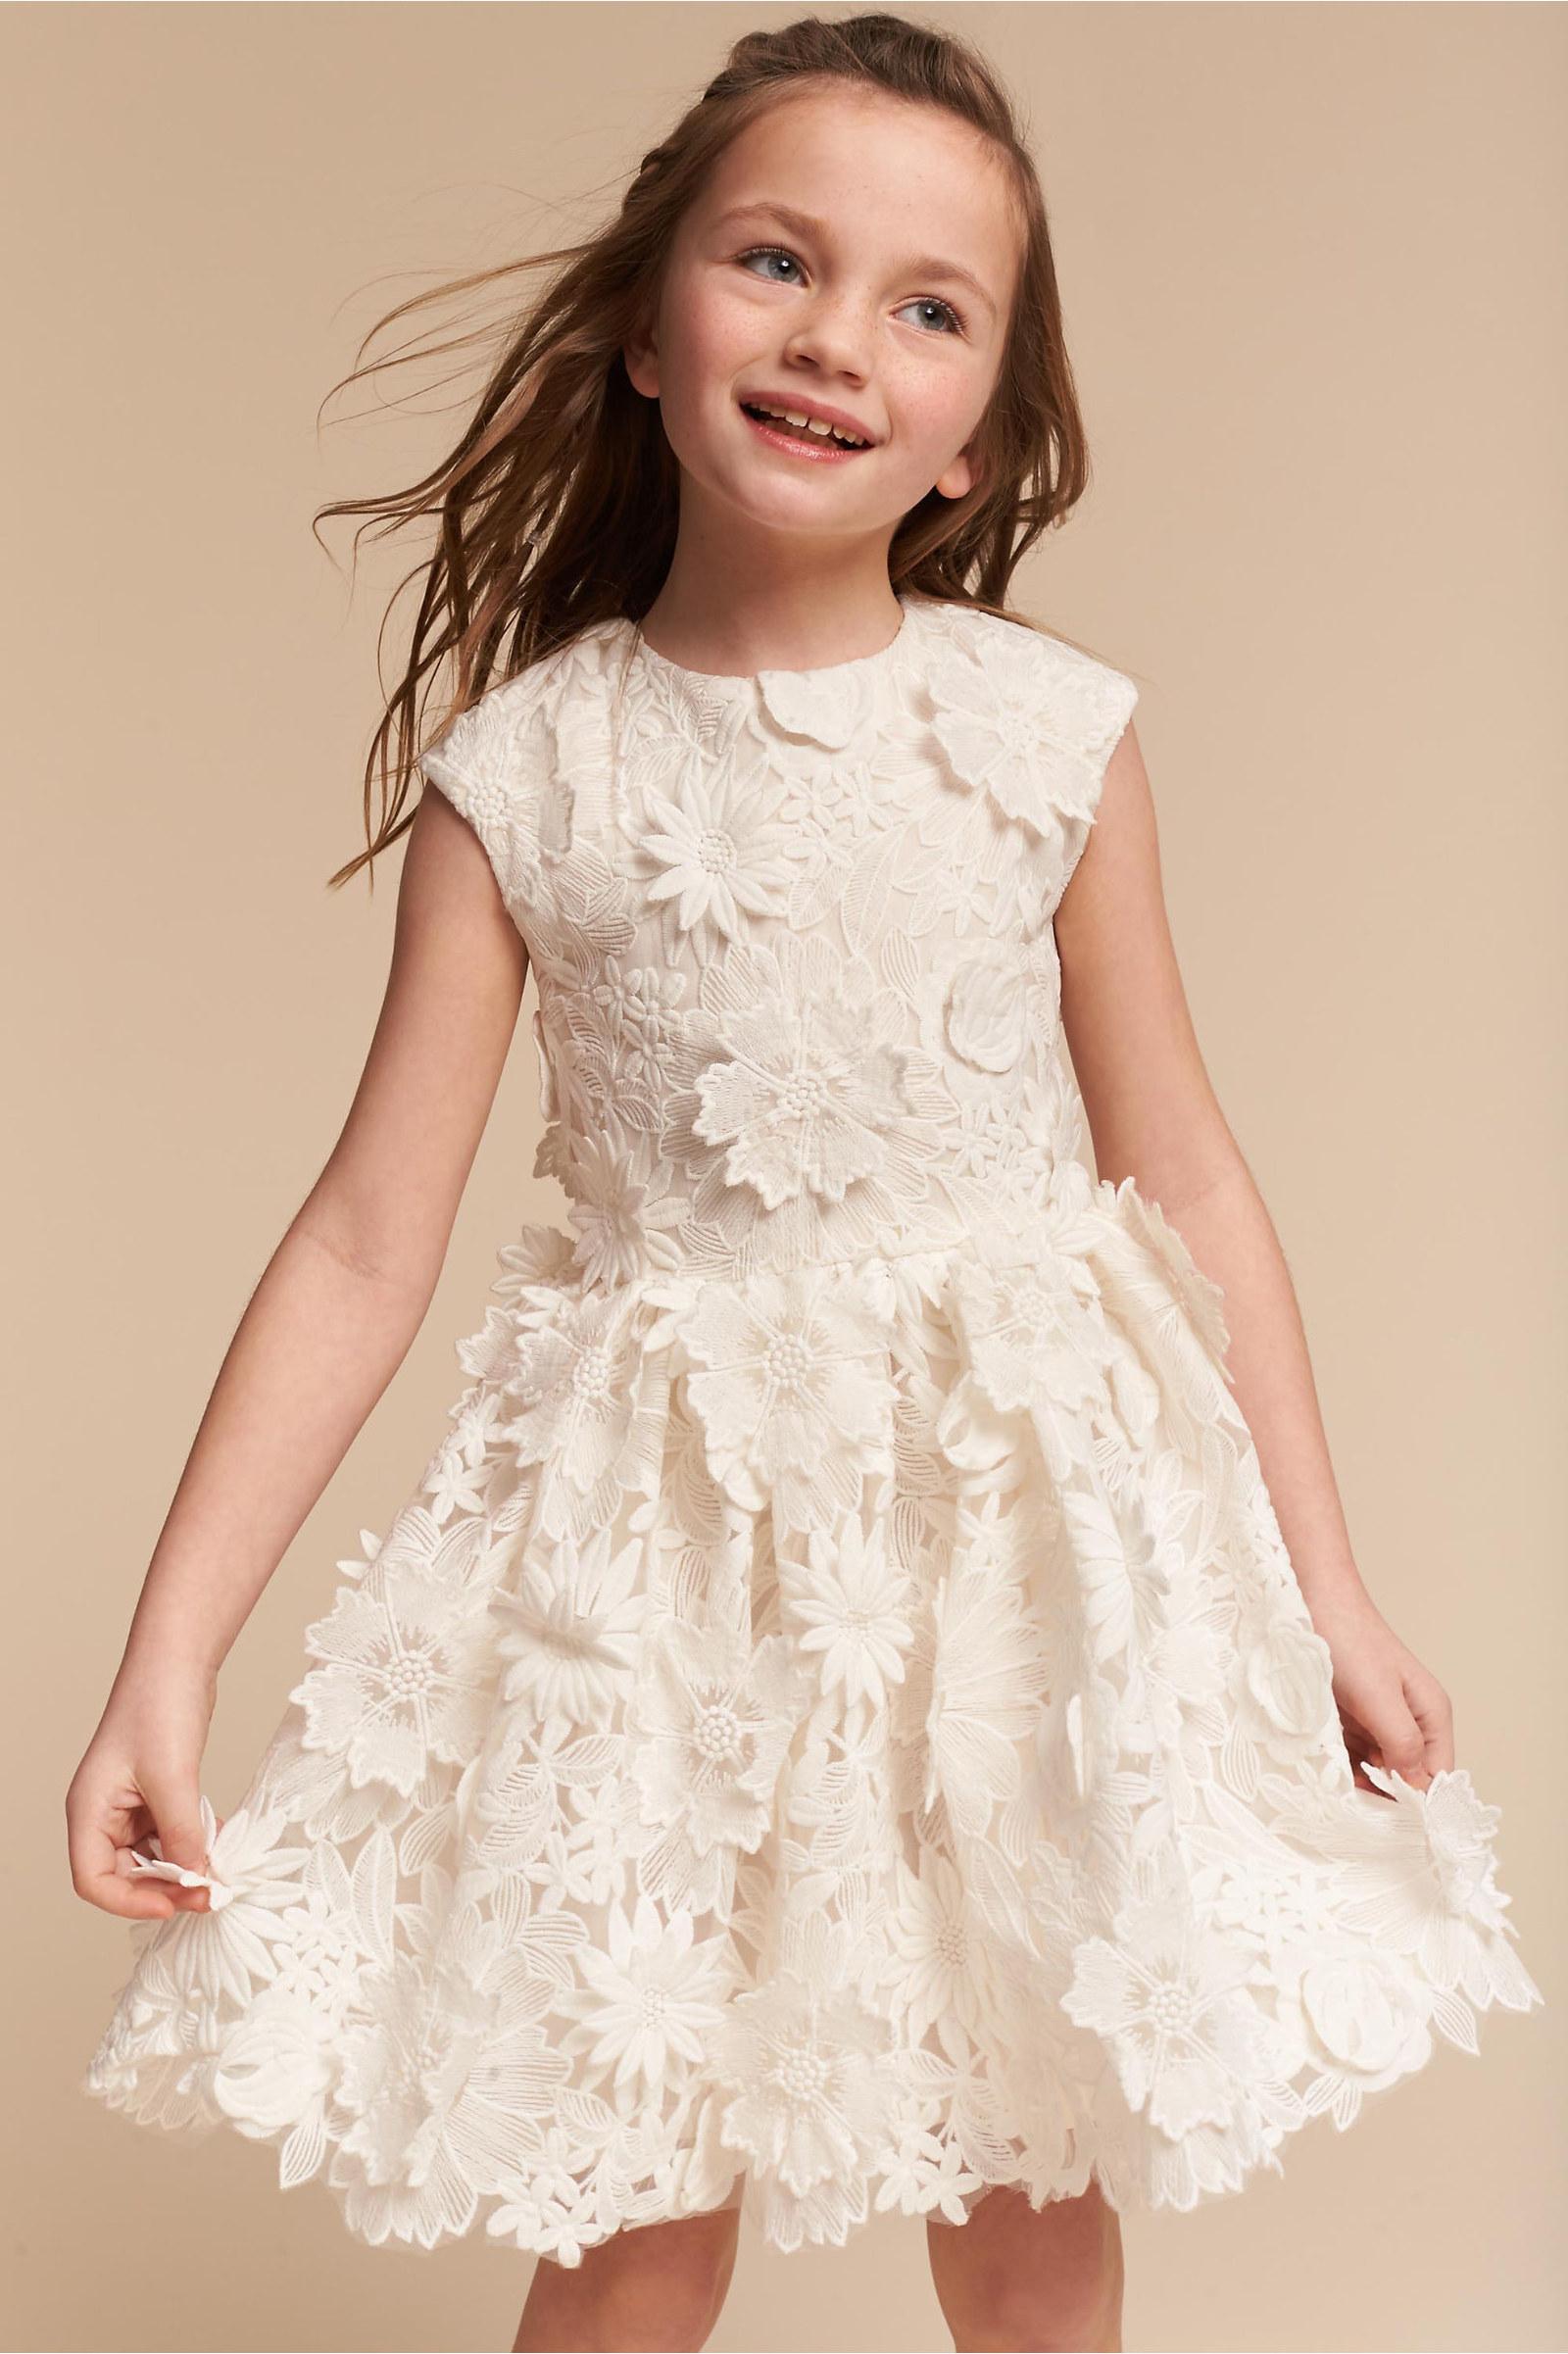 9 Year Girls Dresses